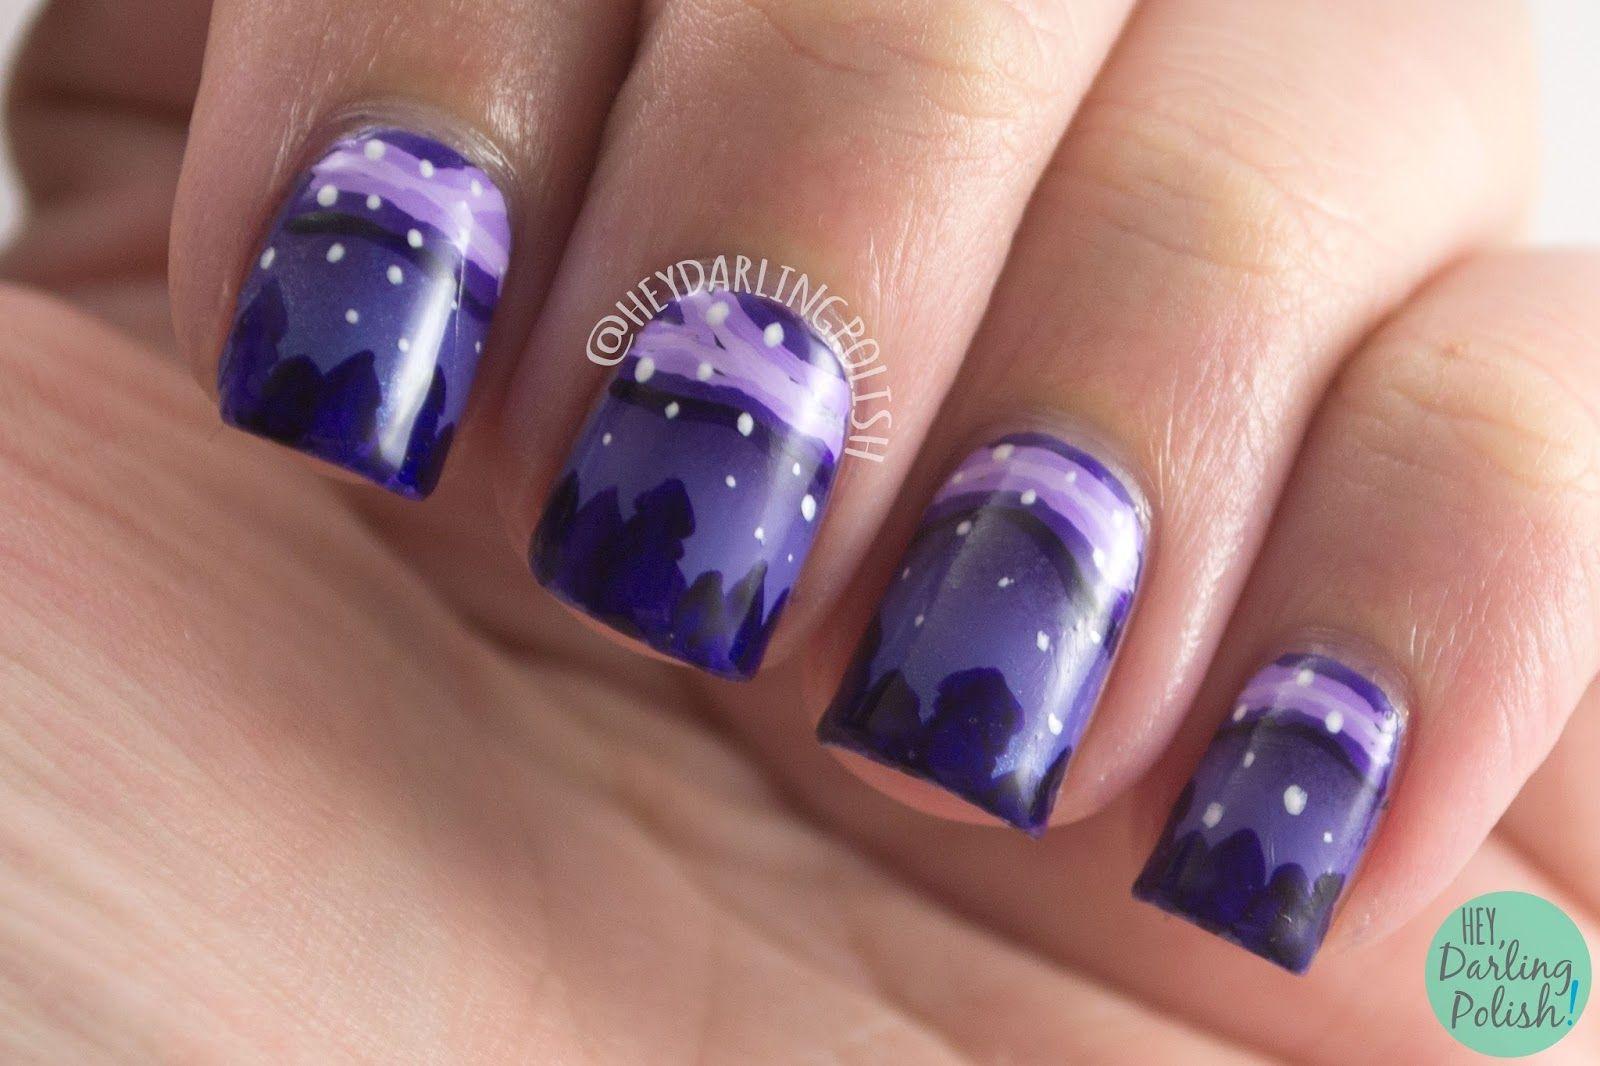 nails, nail art, nail polish, purple, outdoors, trees, night sky ...